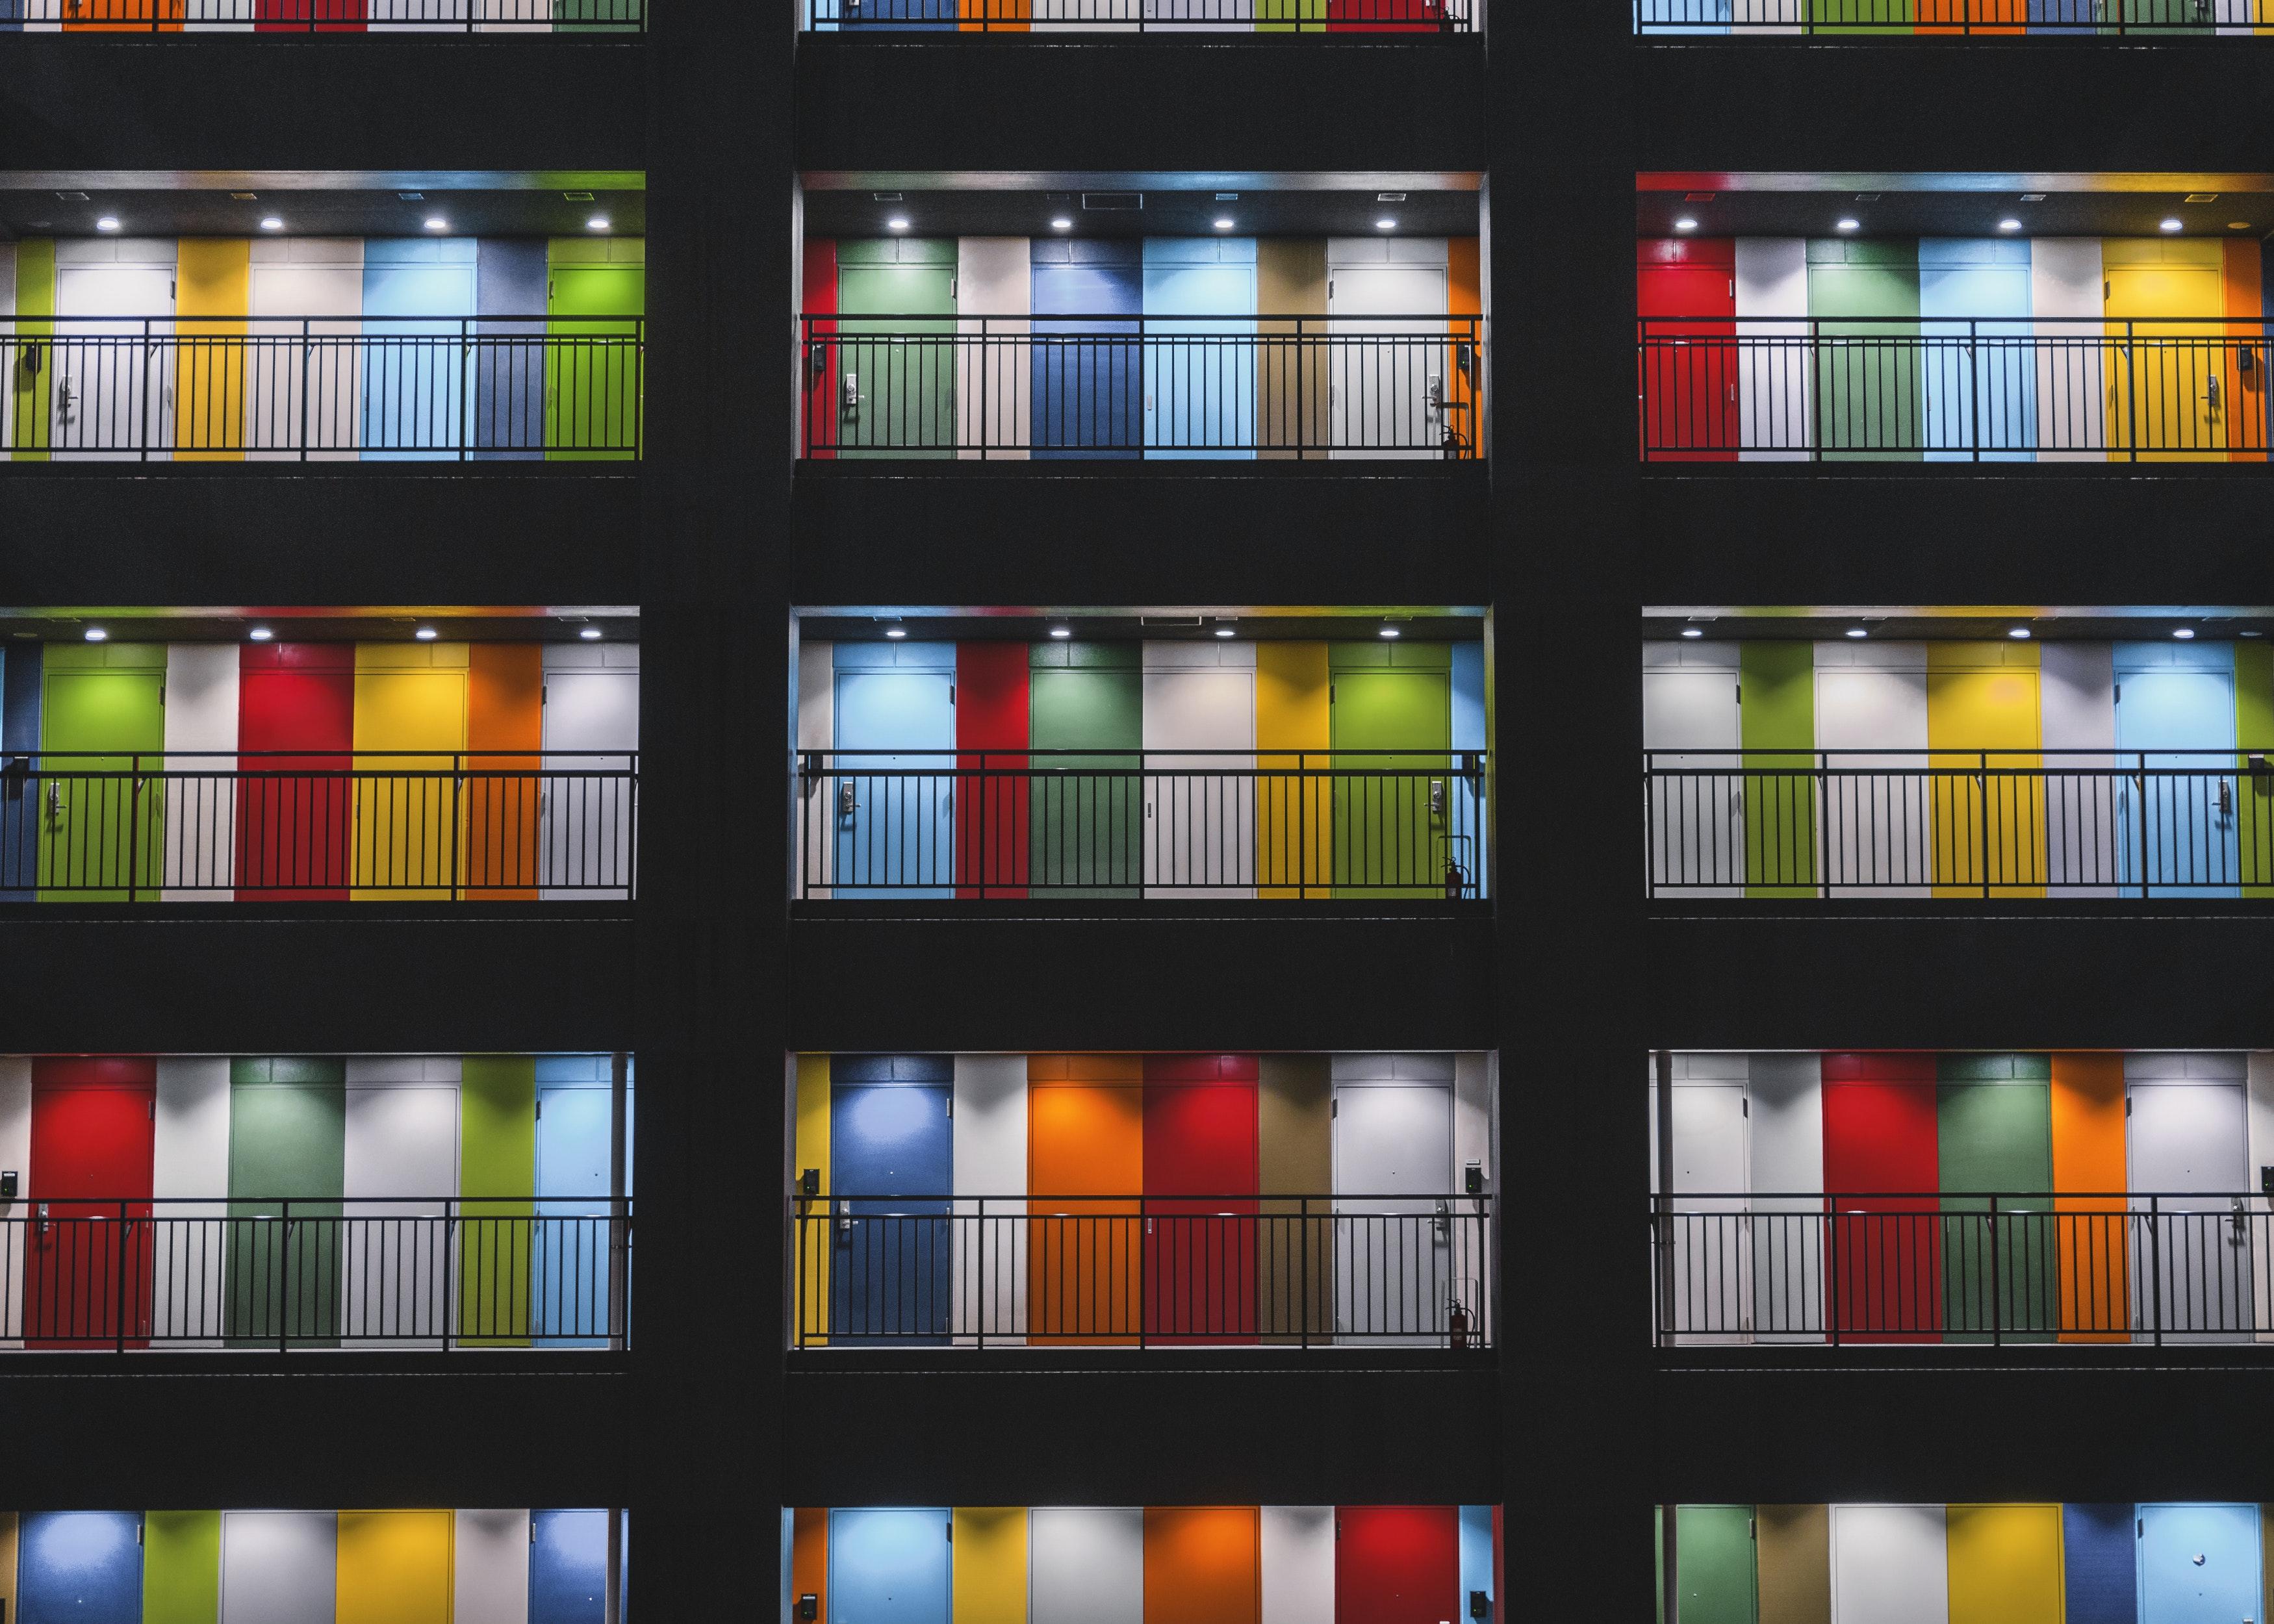 10 eye-opening student accommodation statistics for landlords